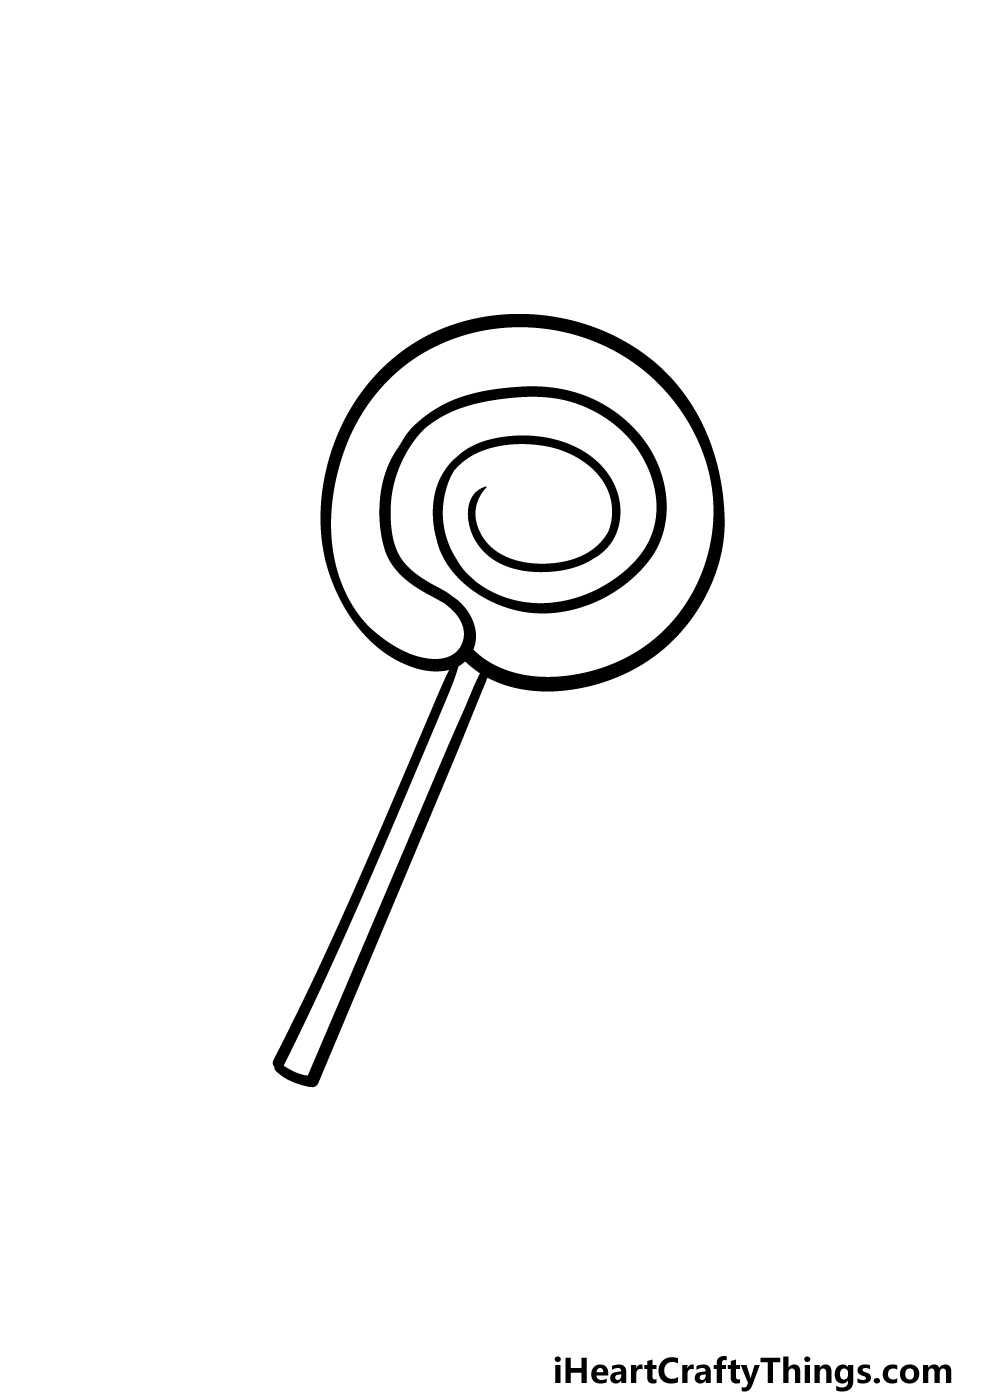 drawing a lollipop step 4